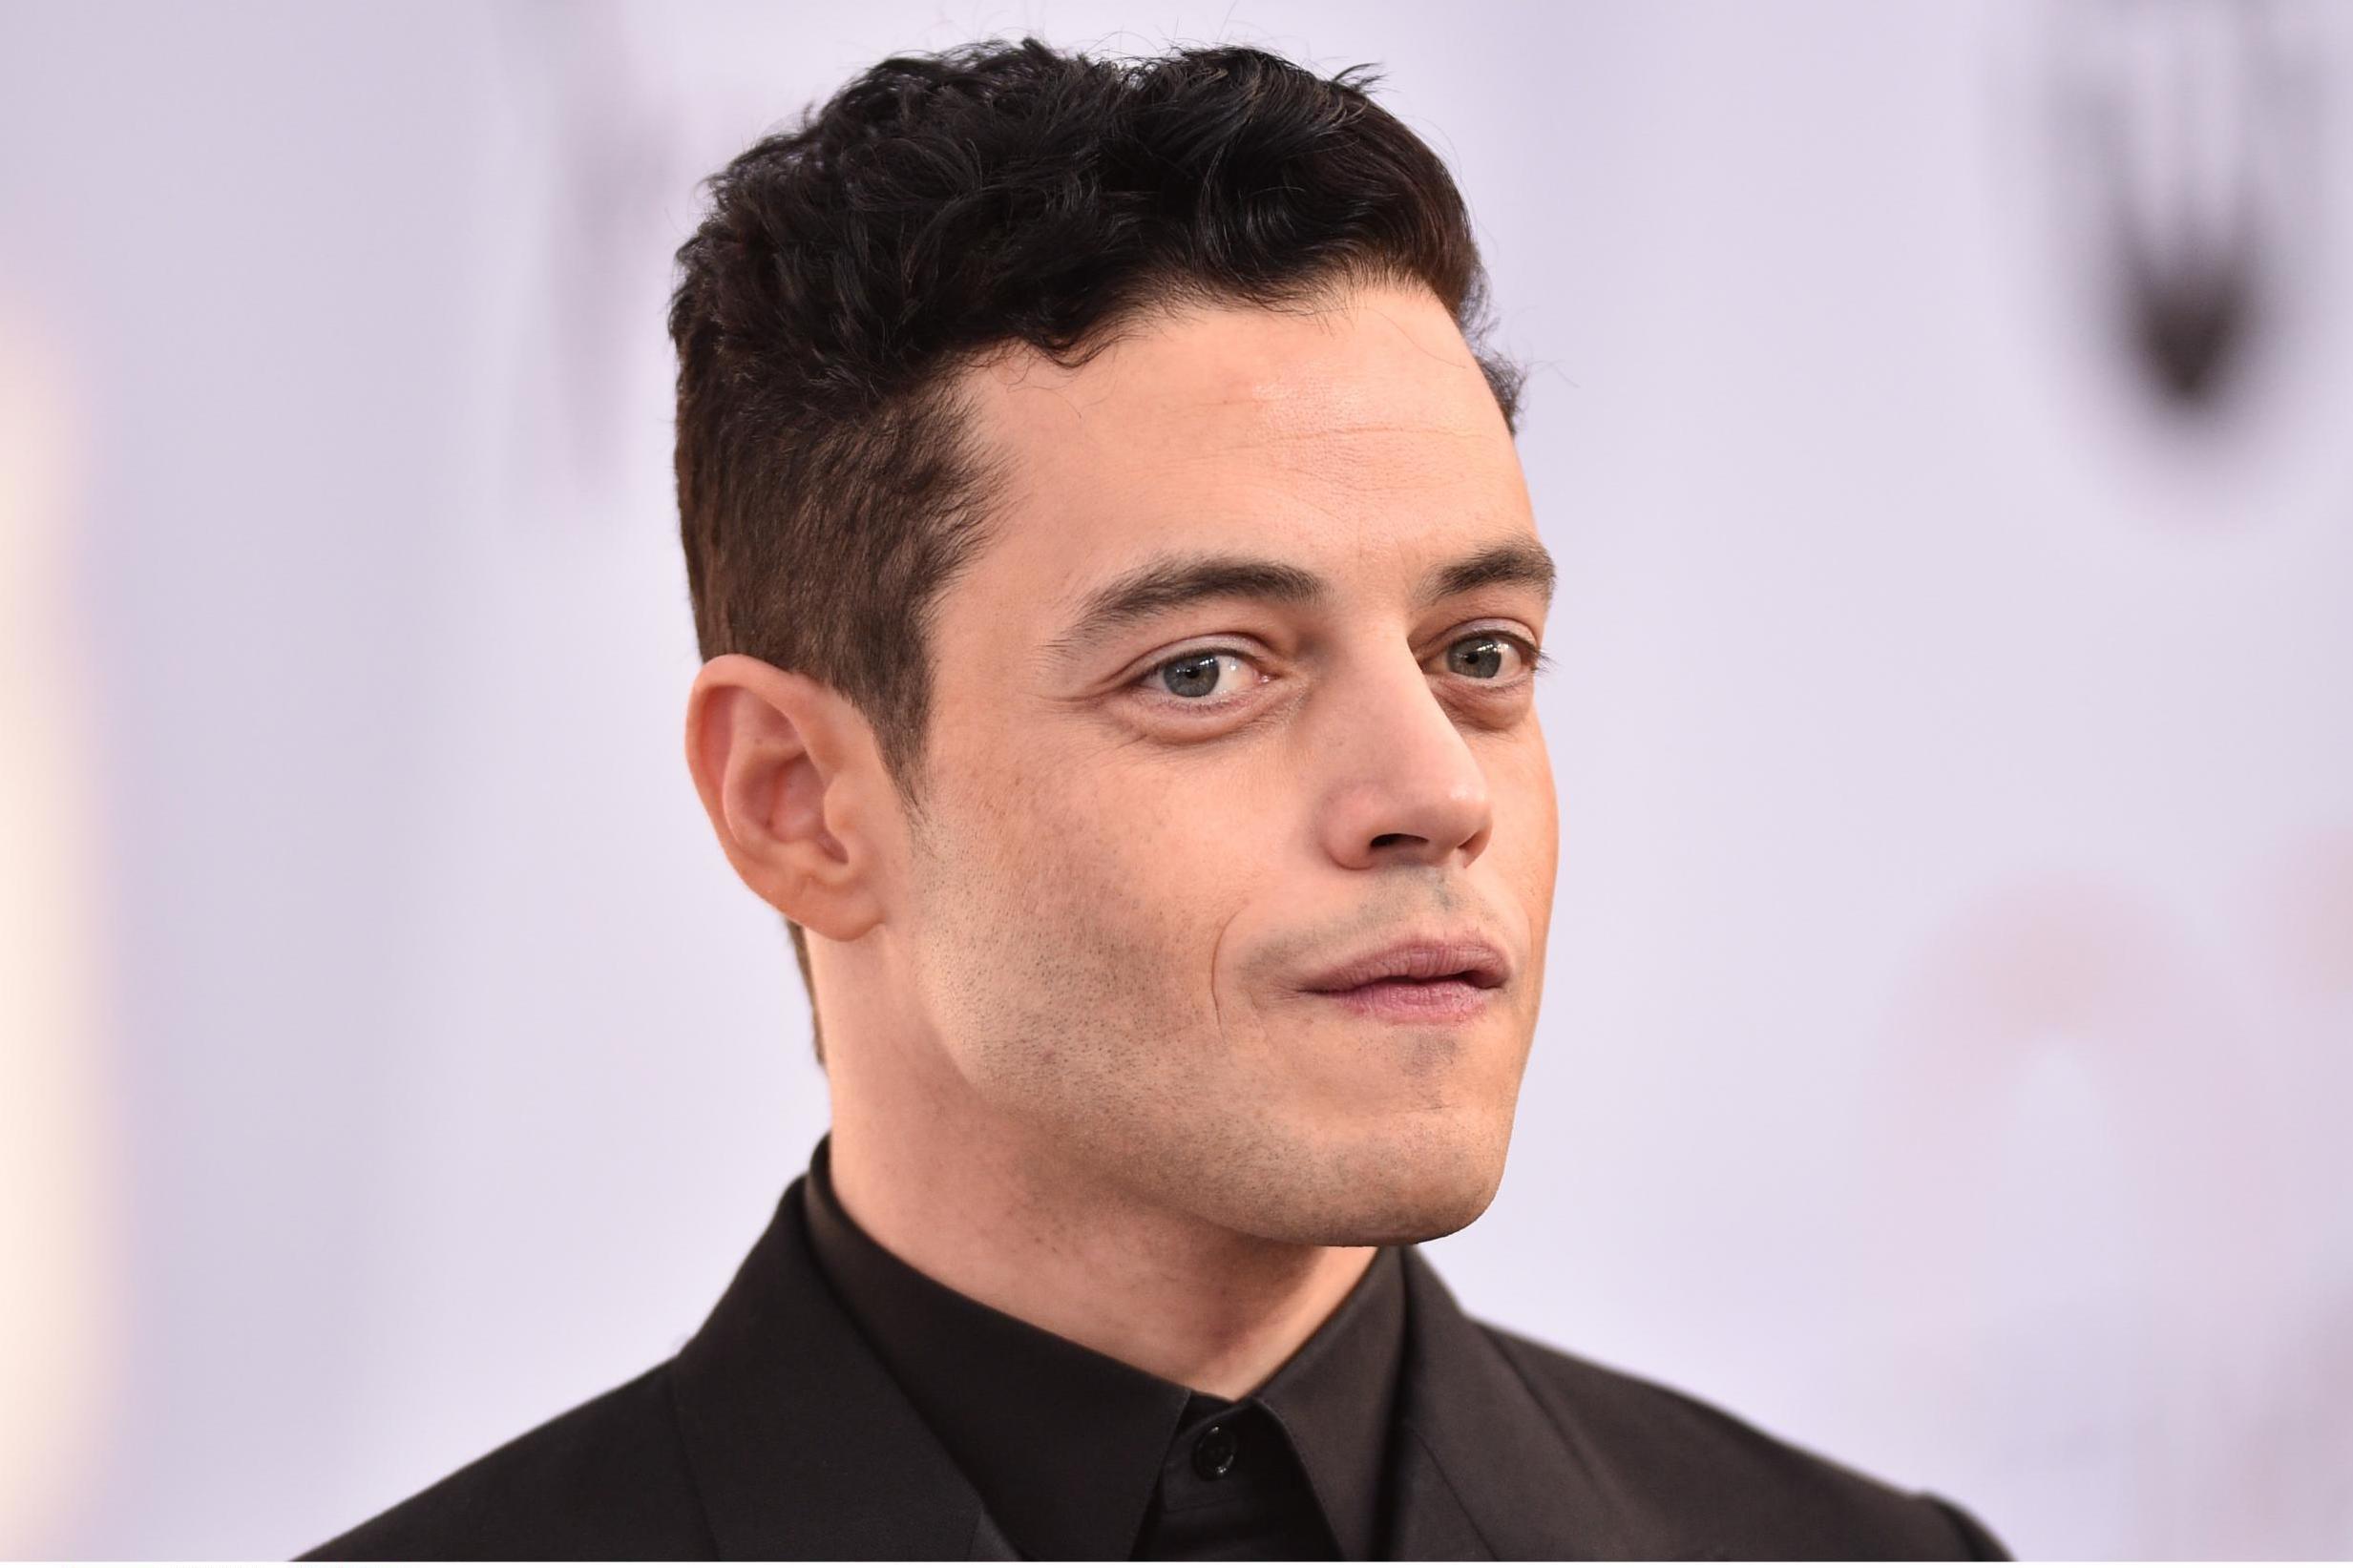 Rami Malek refused to play an Arab terrorist in the new Bond movie